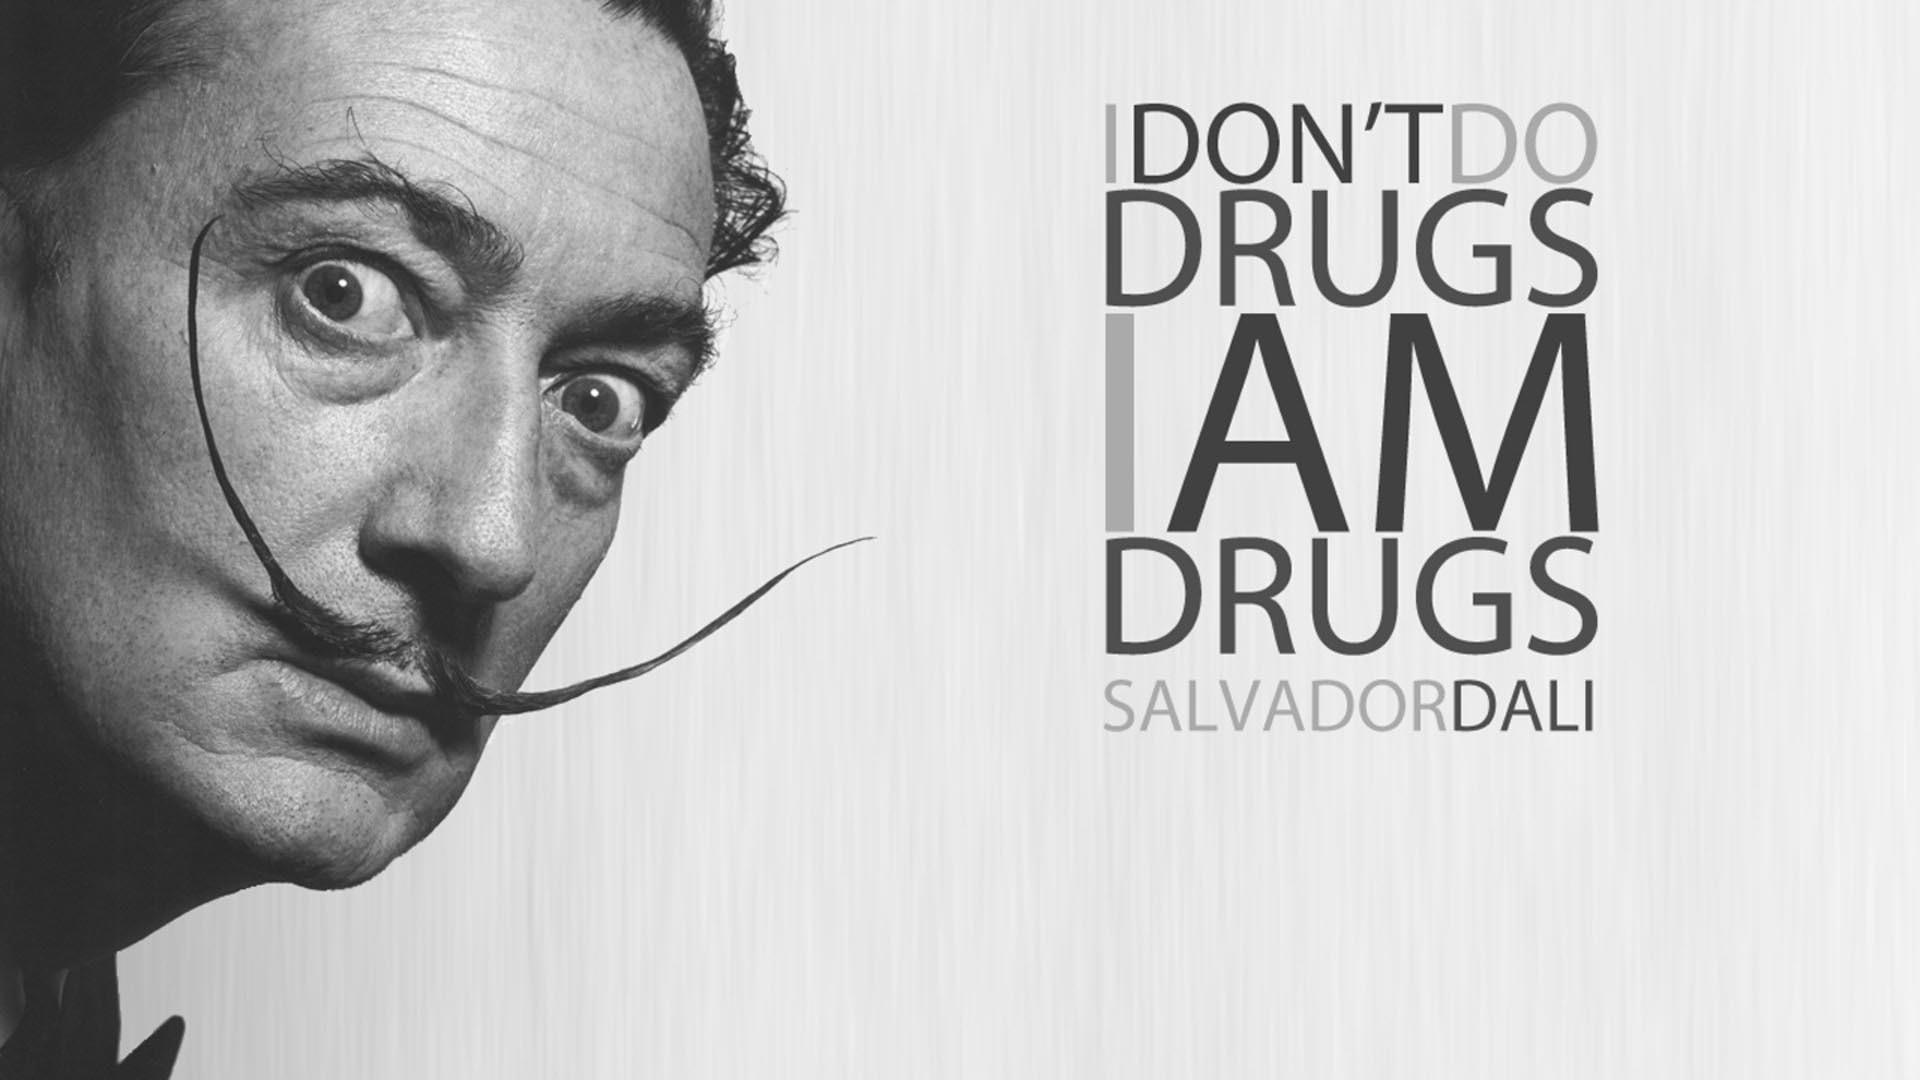 Salvador Dali Quote HD Wallpaper. « »